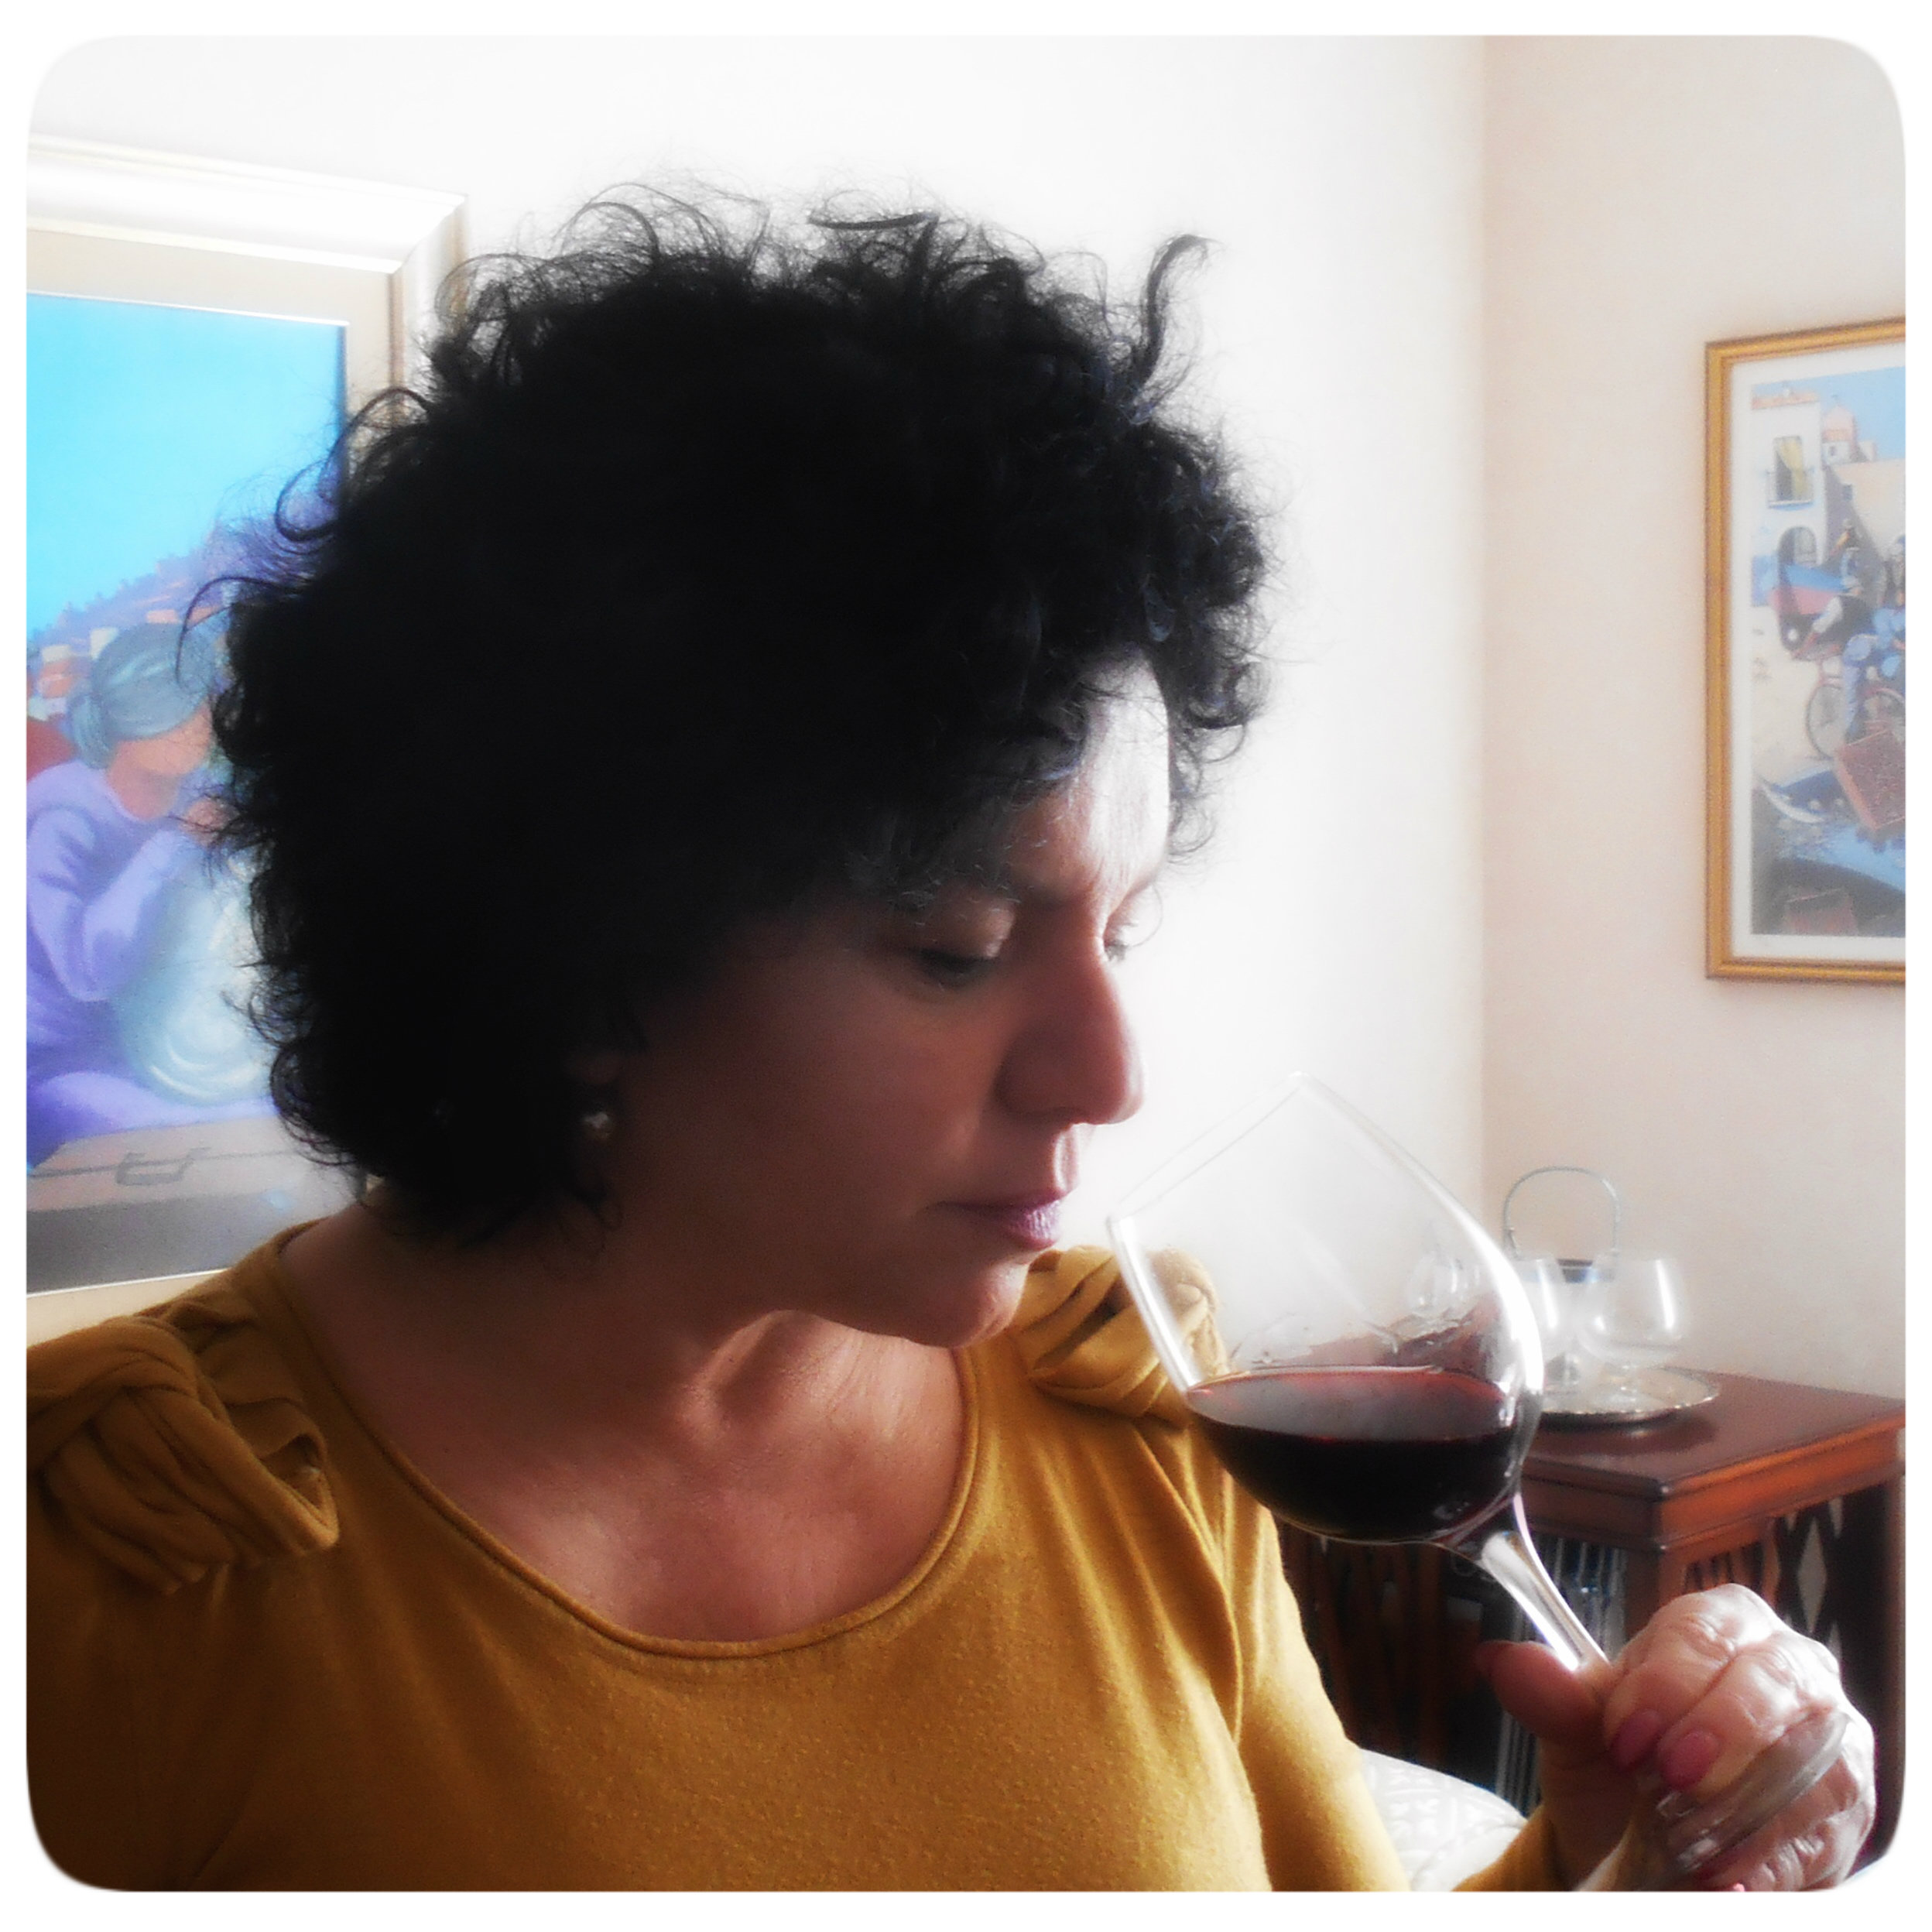 Wine tasting/ Degustazione del vino,  here .